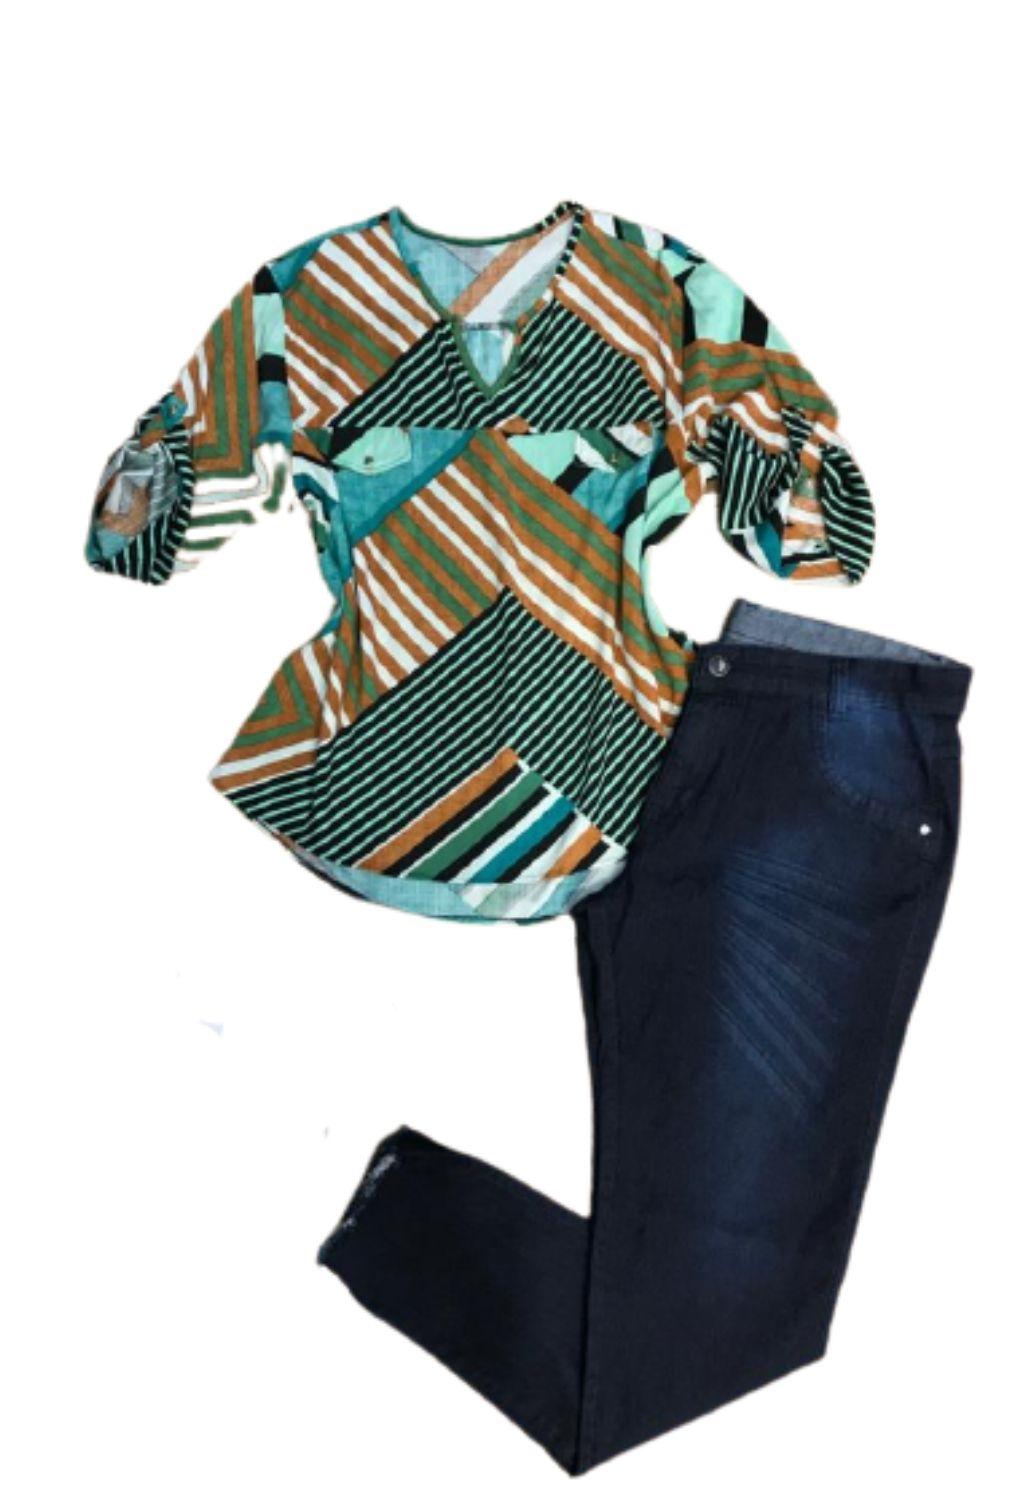 Camisa Blusa Feminina Manga Curta Social Estampada Verde  - ModaStore